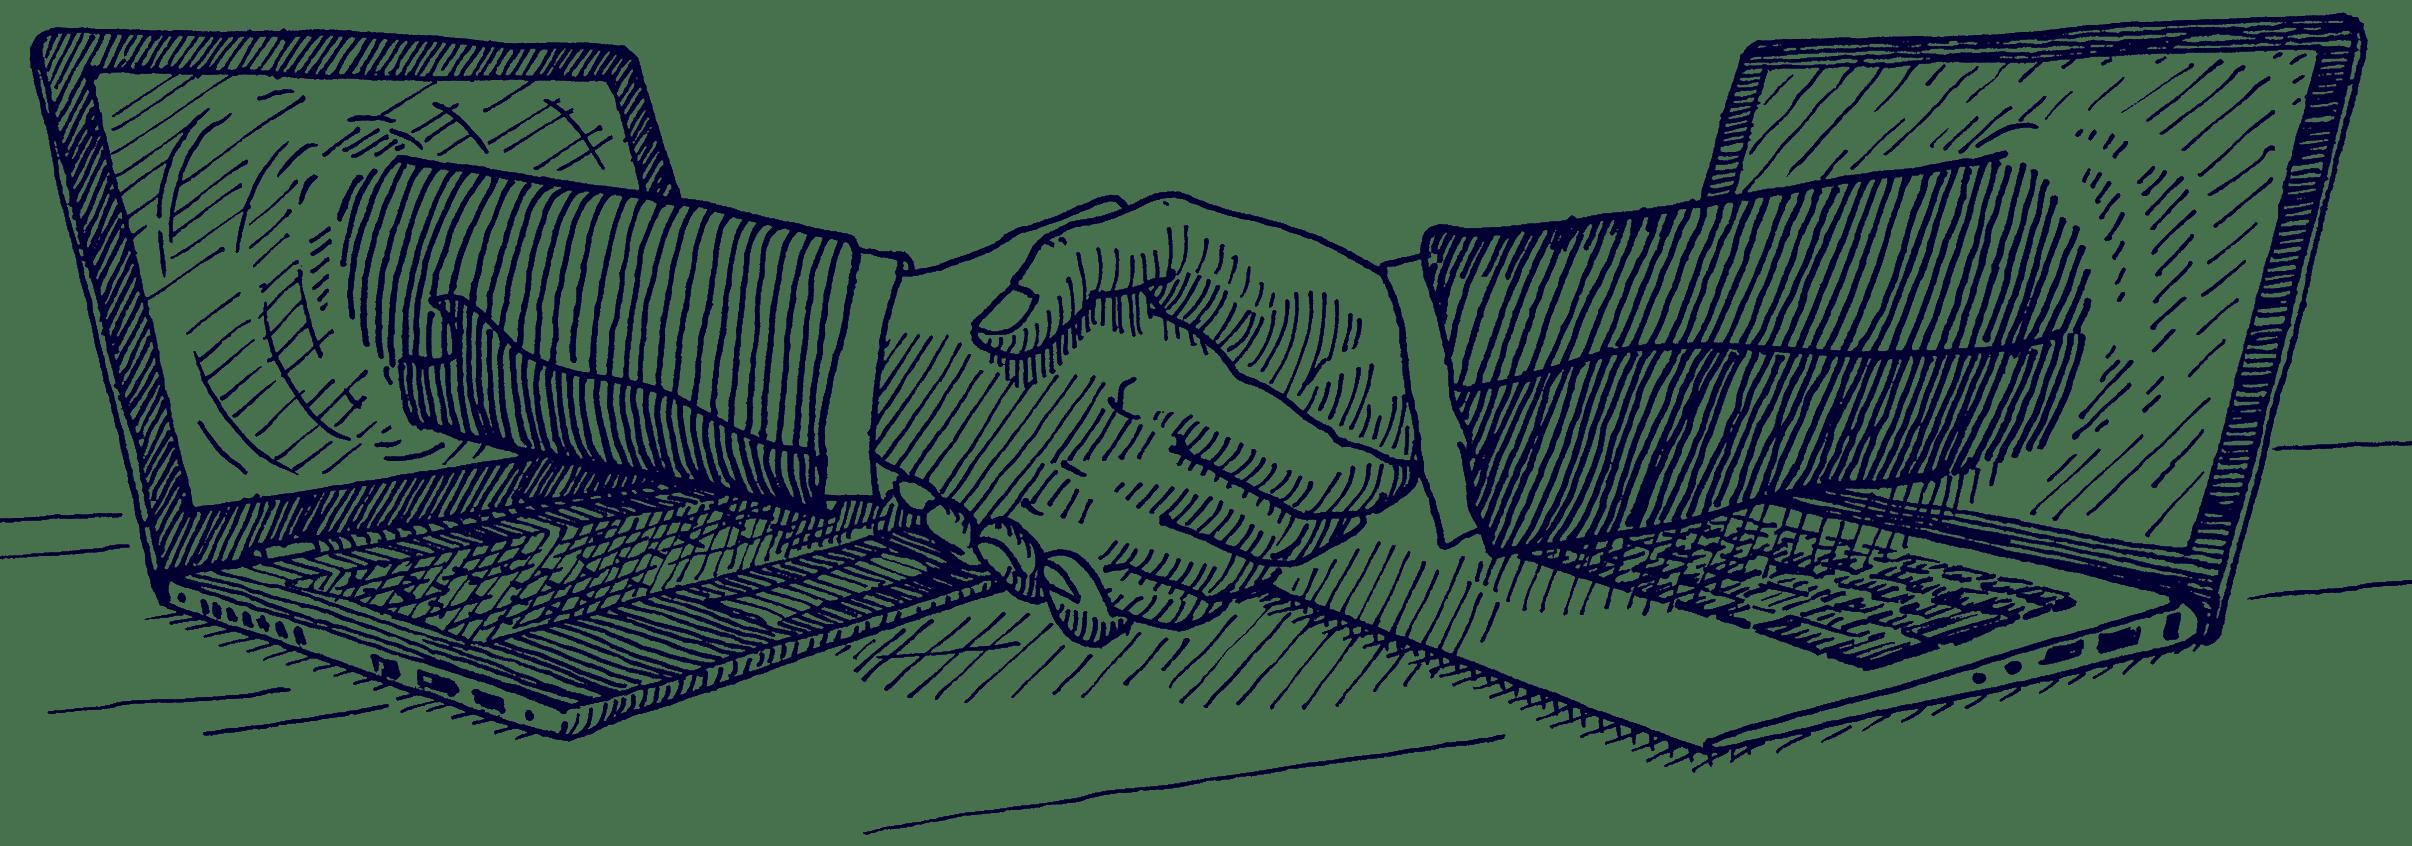 Computer Handshake | Haslinger / Nagele, Illustration: Karlheinz Wasserbacher